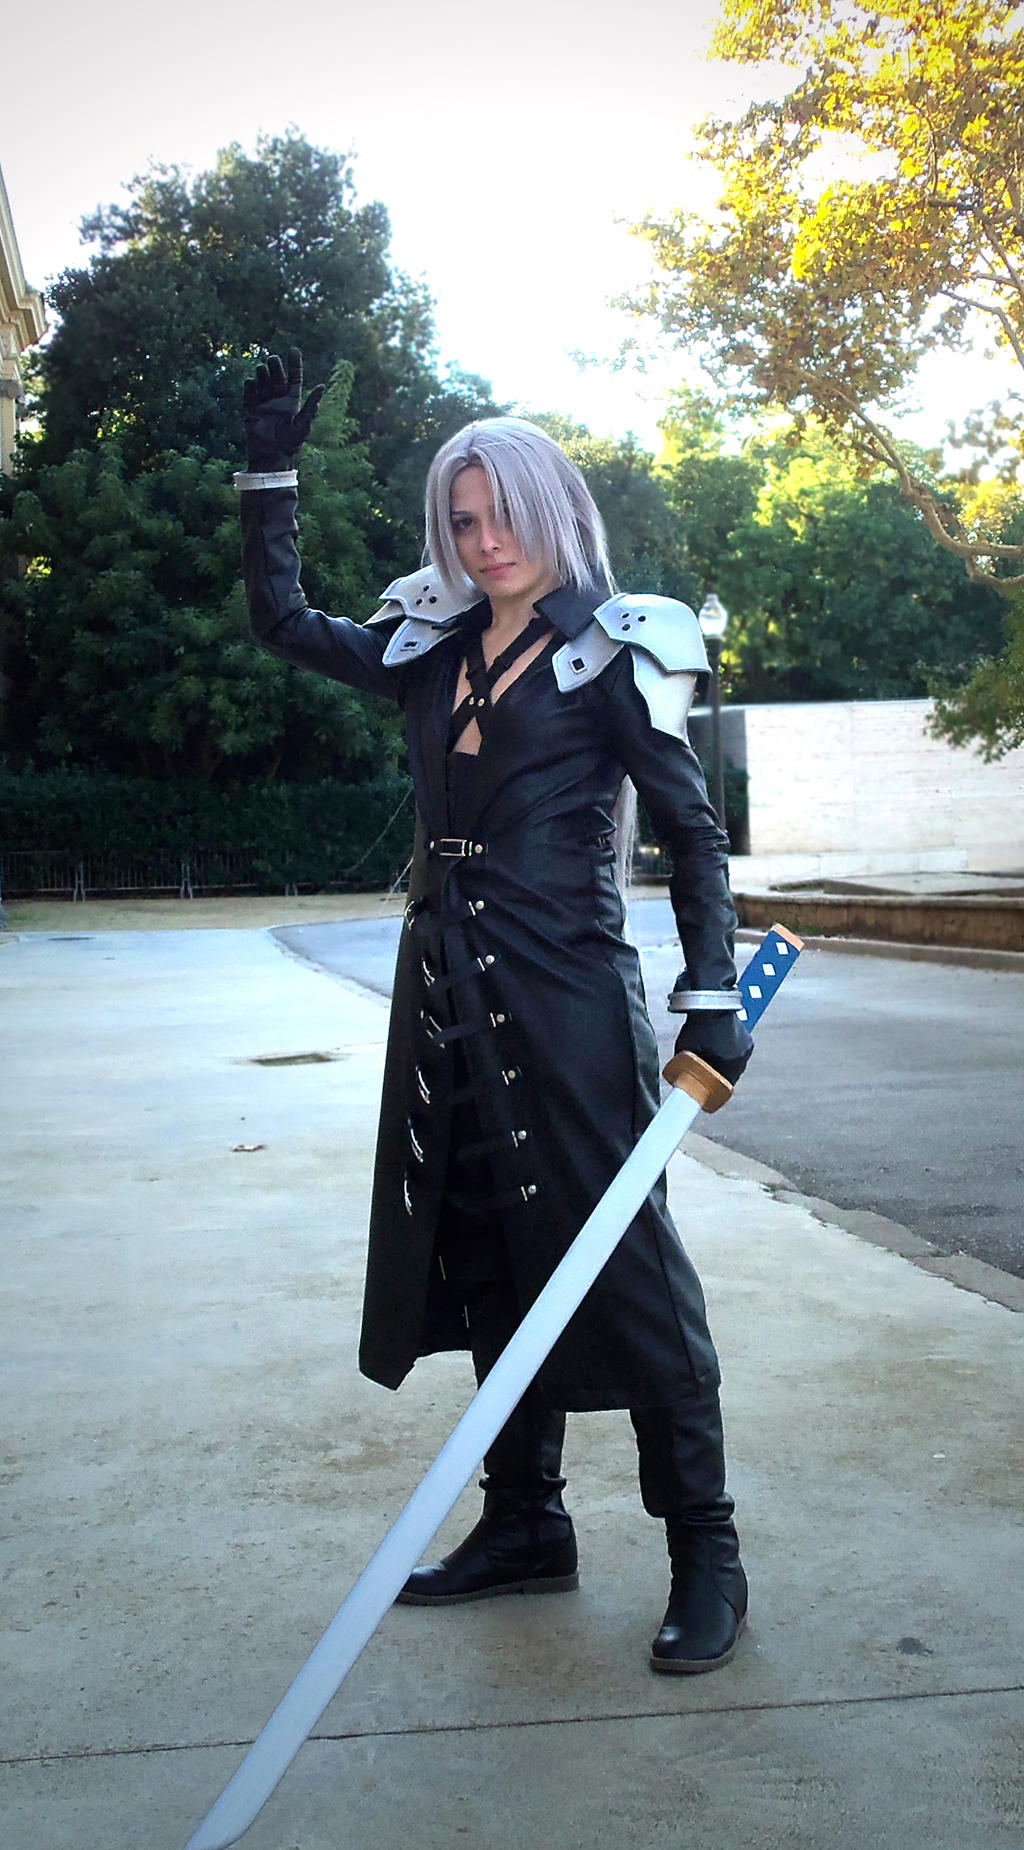 Sephiroth Cosplay I By Mmmhomoshiroi On Deviantart